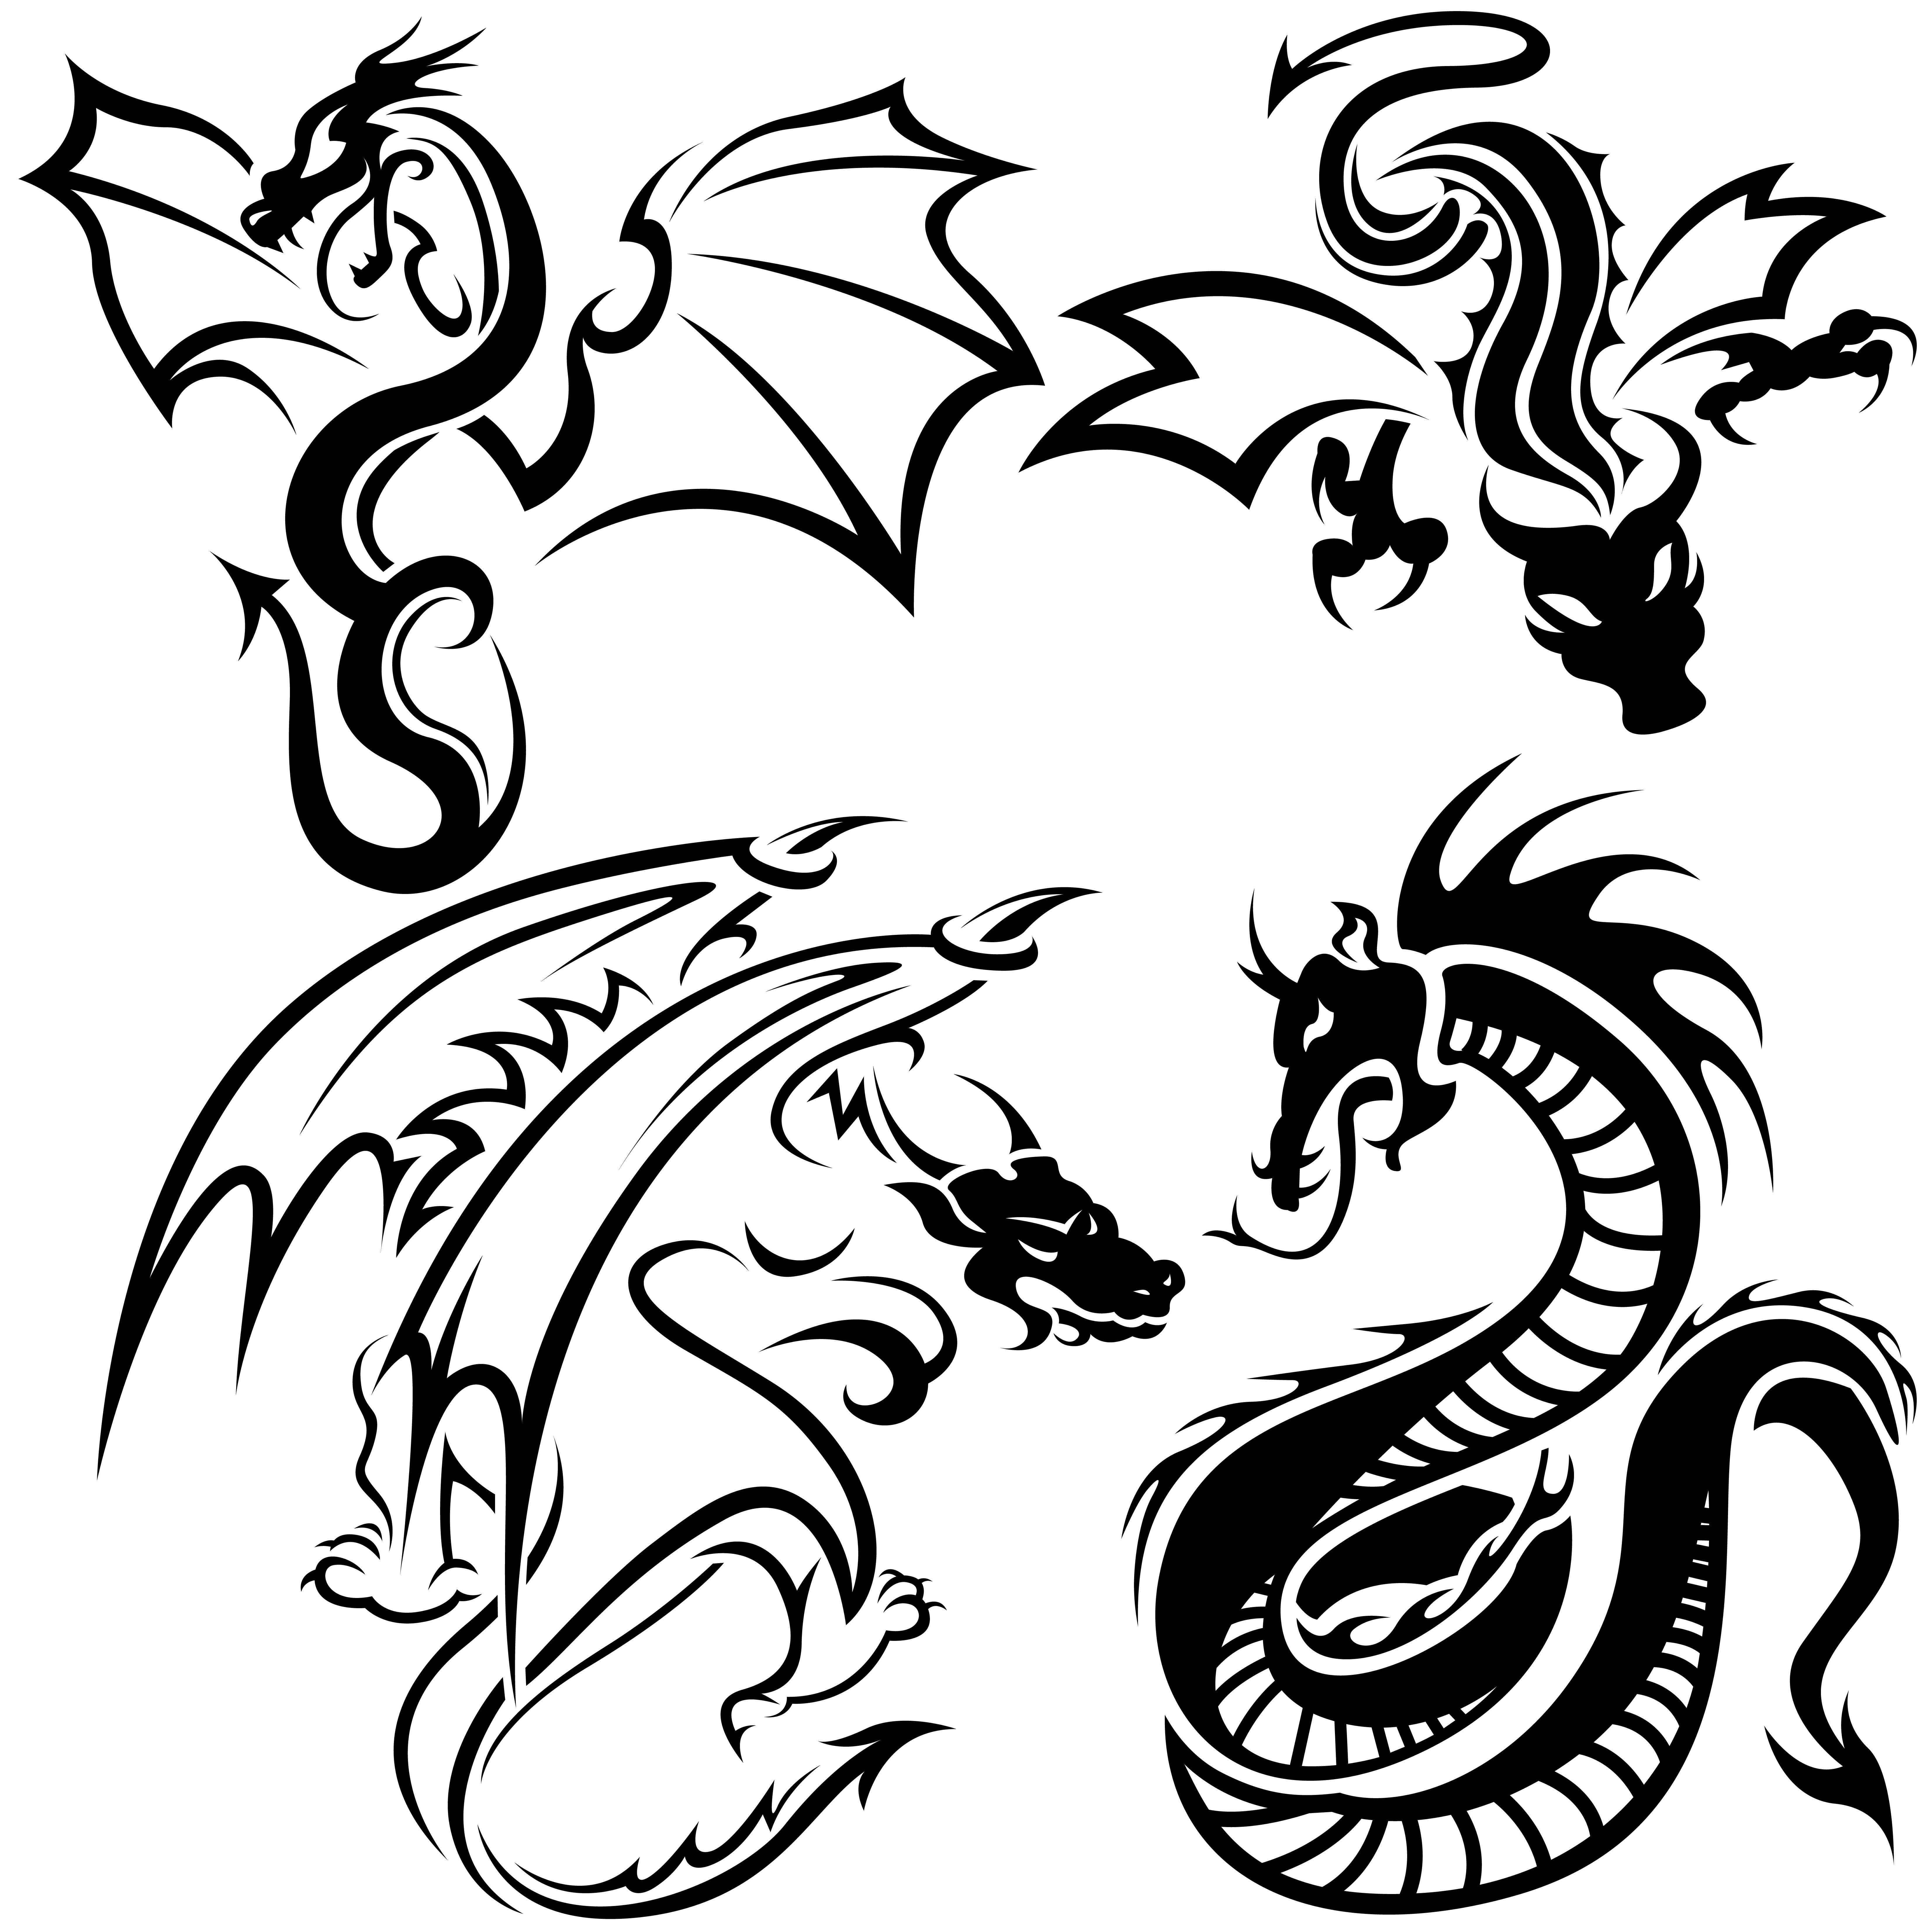 Foto Tato Naga Check More At Https Www Tatto Id